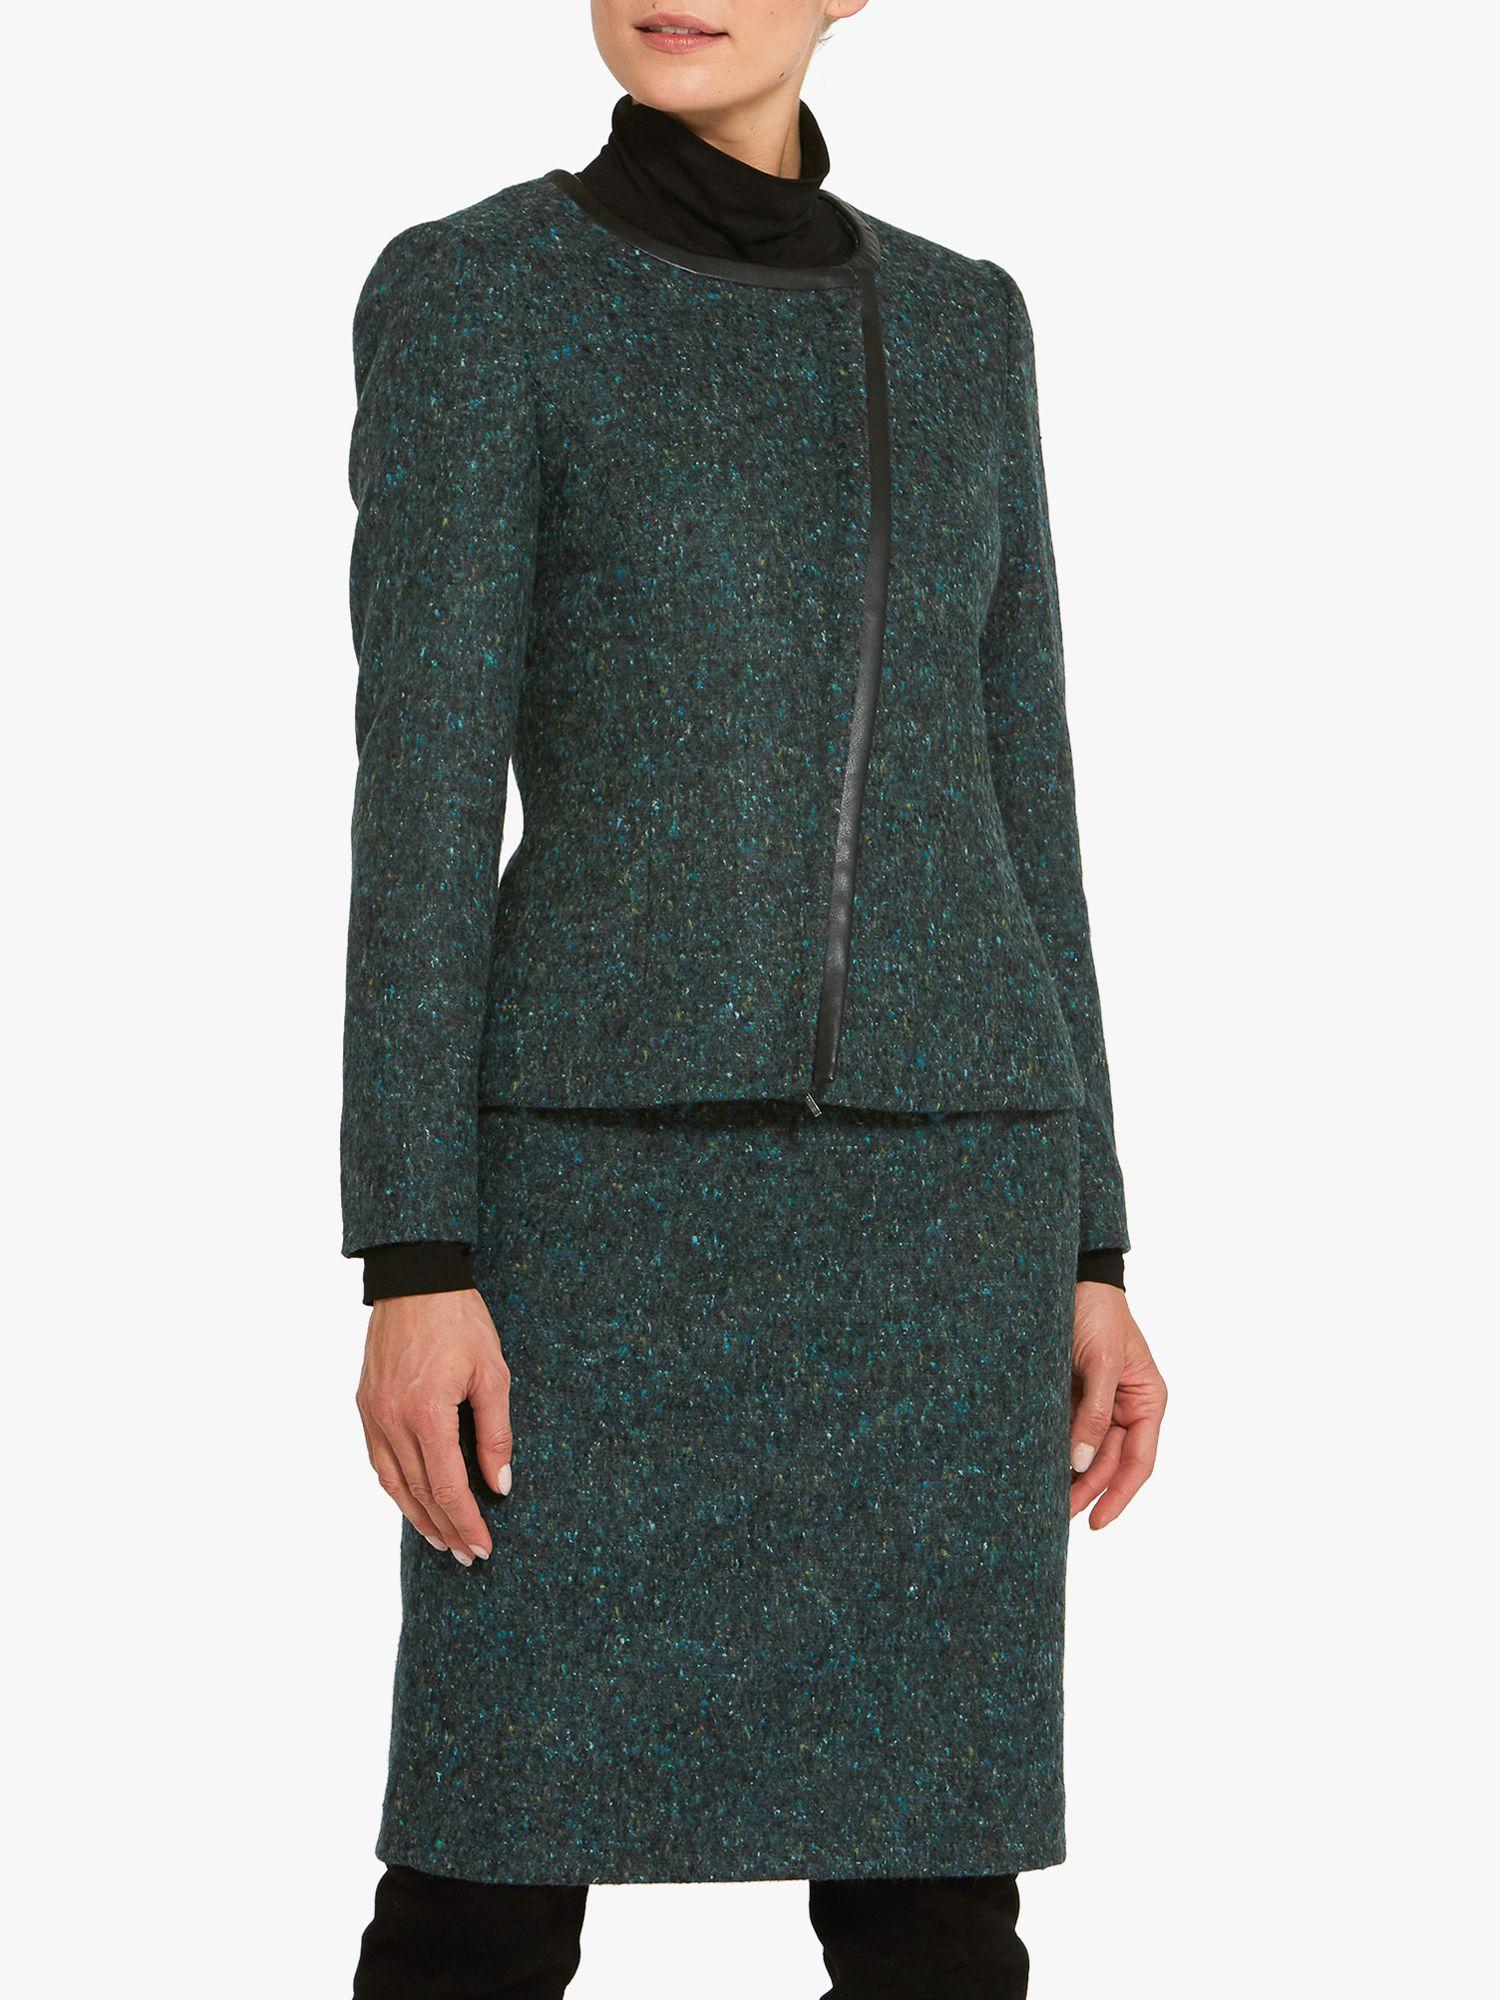 Helen McAlinden Helen McAlinden Blair Faux Leather Trim Jacket, Teal